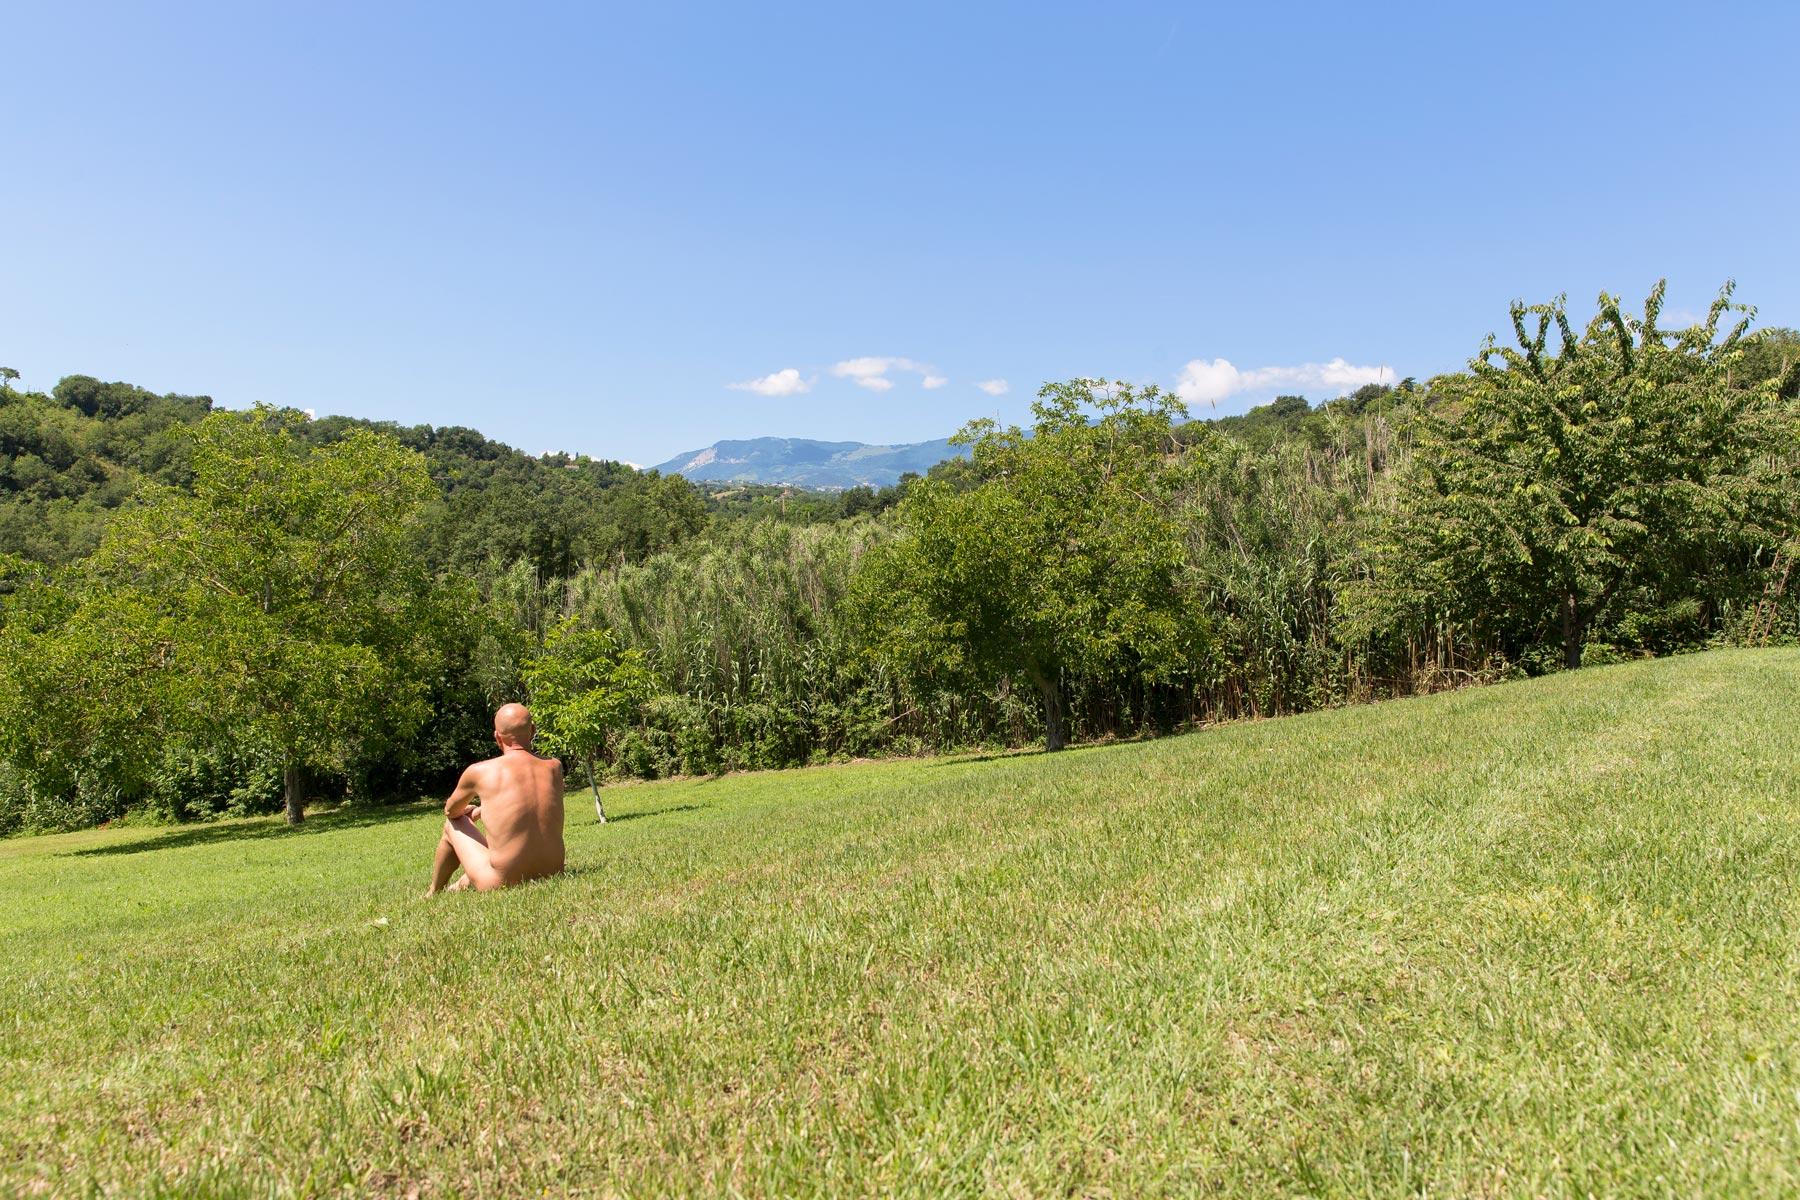 7-11 giugno - Abruzzo - Our Big Naked Italian Road Trip 2021 - Fenait